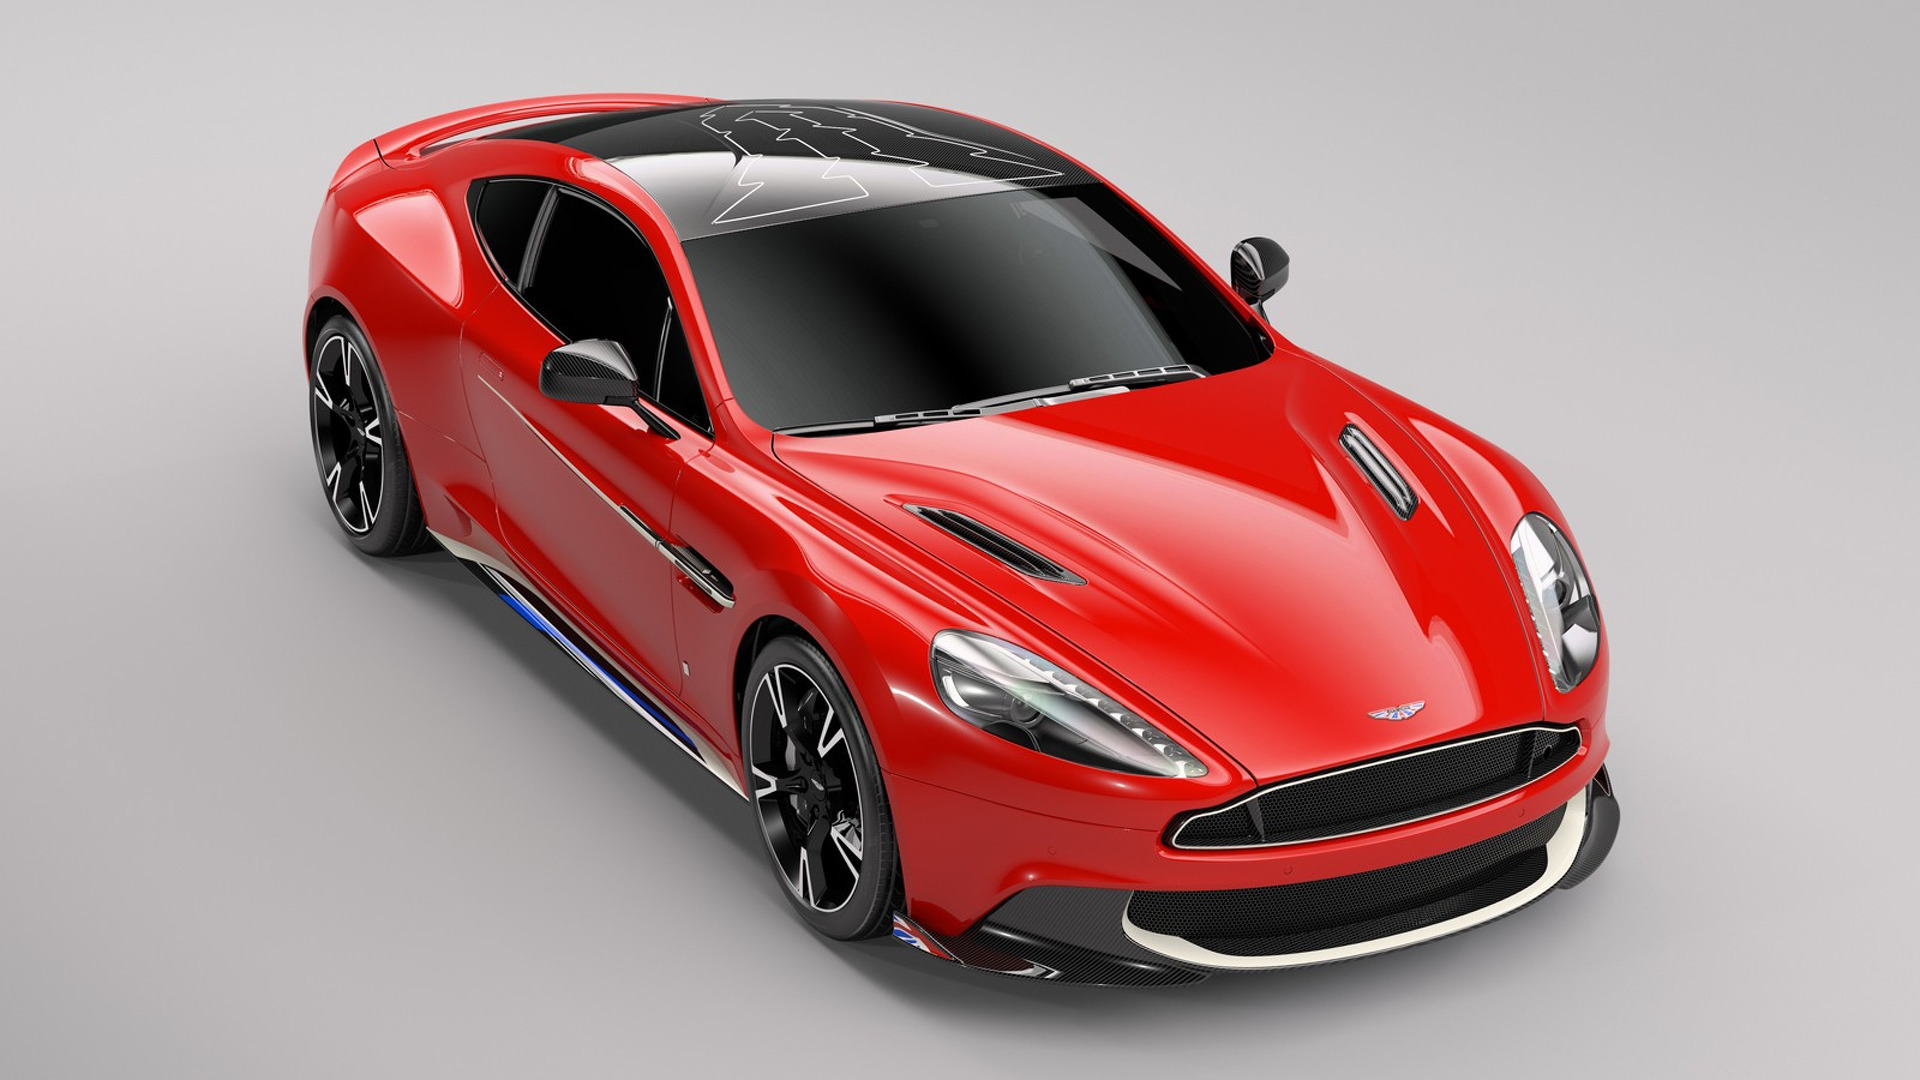 Aston Martin Vanquish S Red Arrows Honors British Royal Air Force